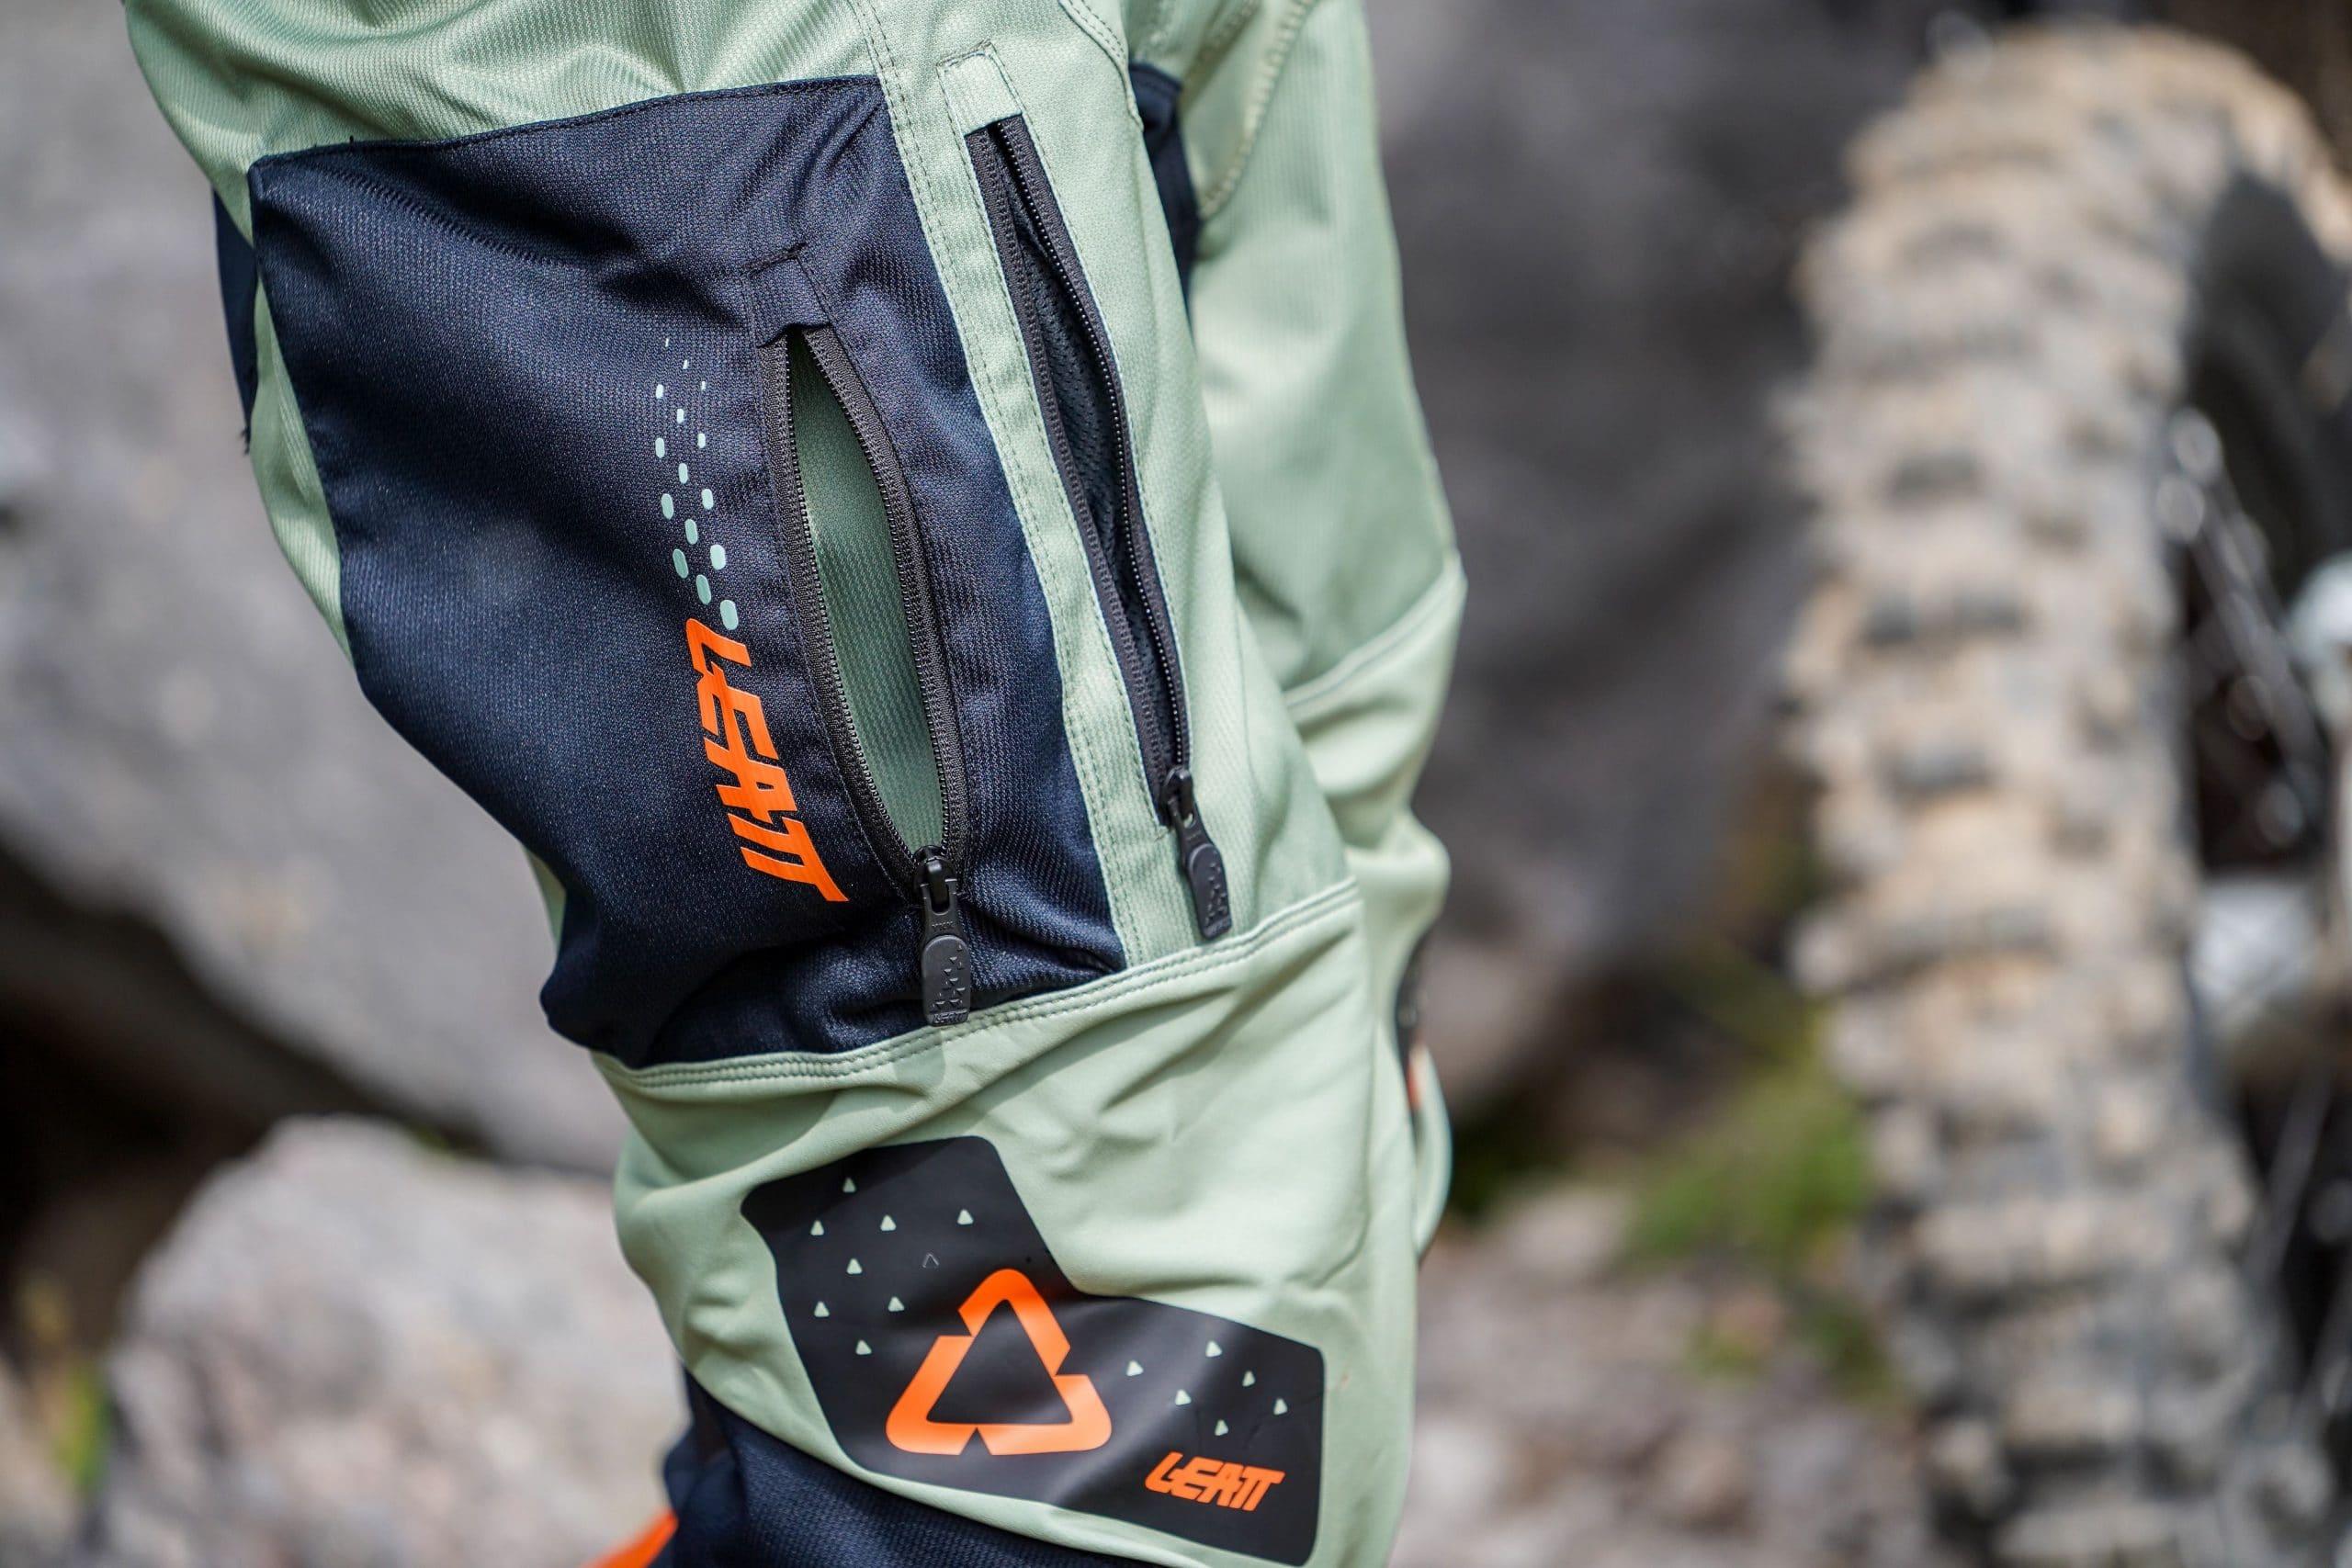 Le pantalon durable de la gamme Enduro. Source: https://leatt.com/int